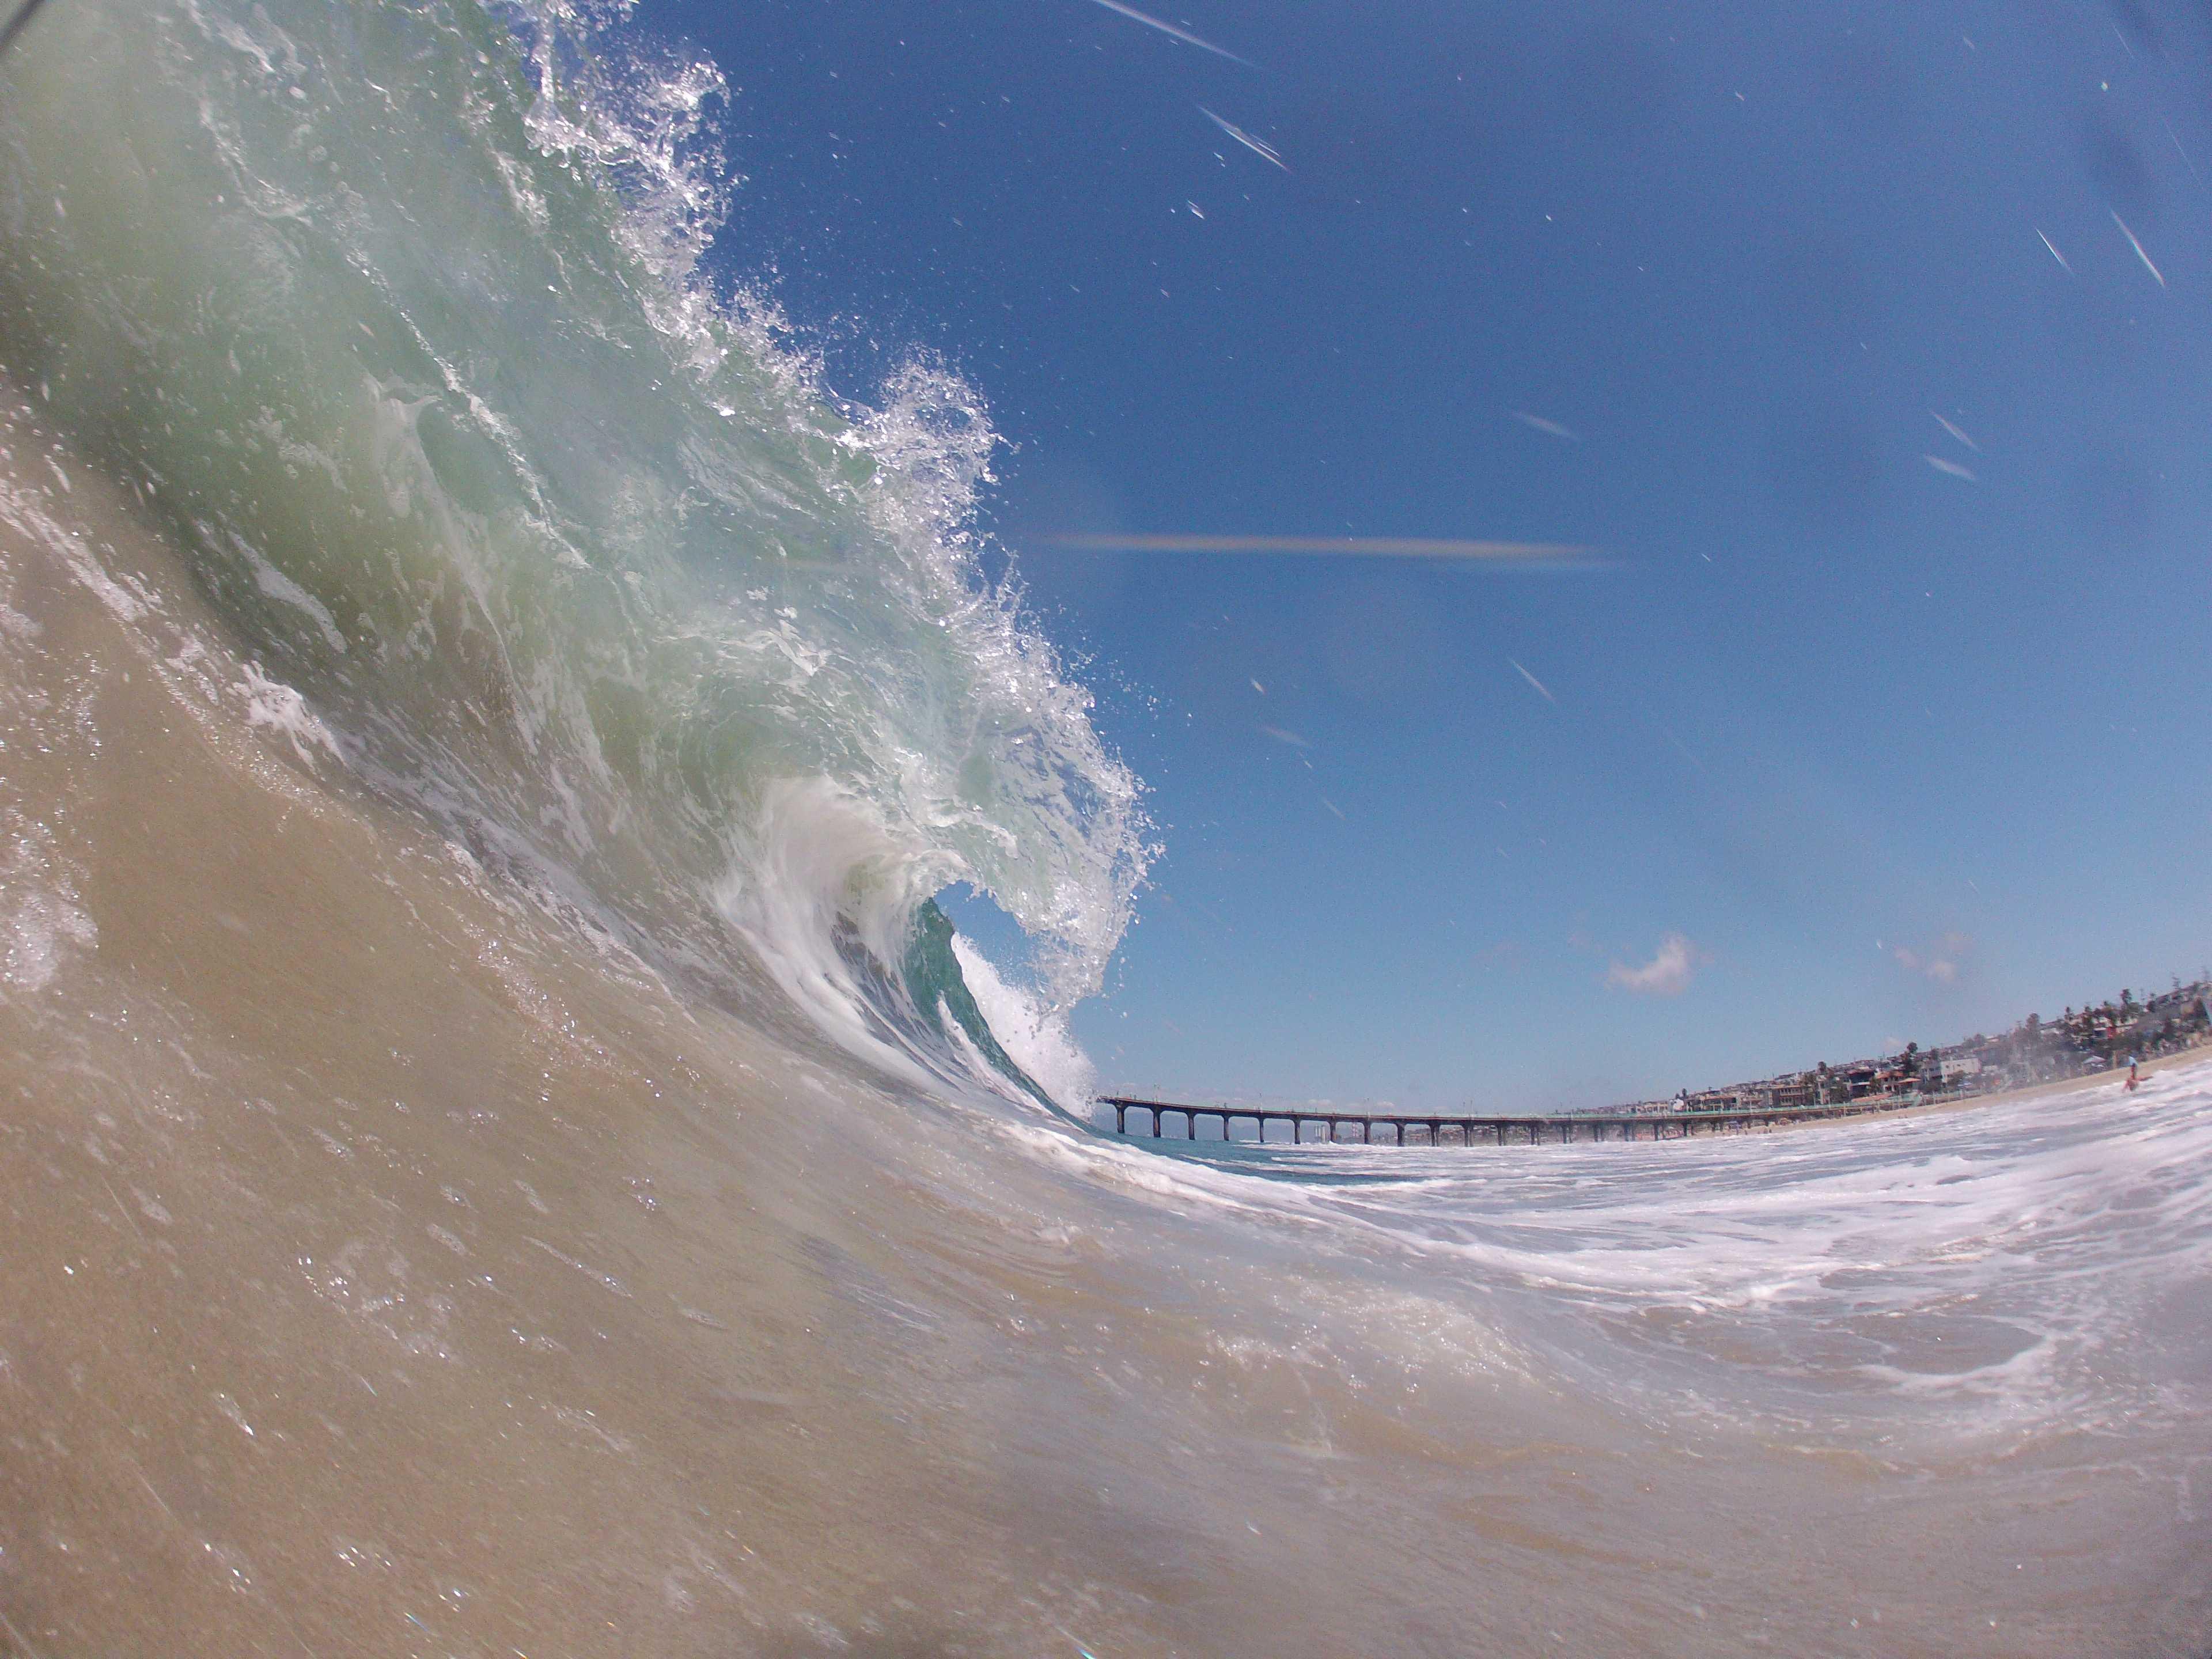 Gillen%27s+photo+of+a+wave.+Photographer%3A+Cushman+Gillen.